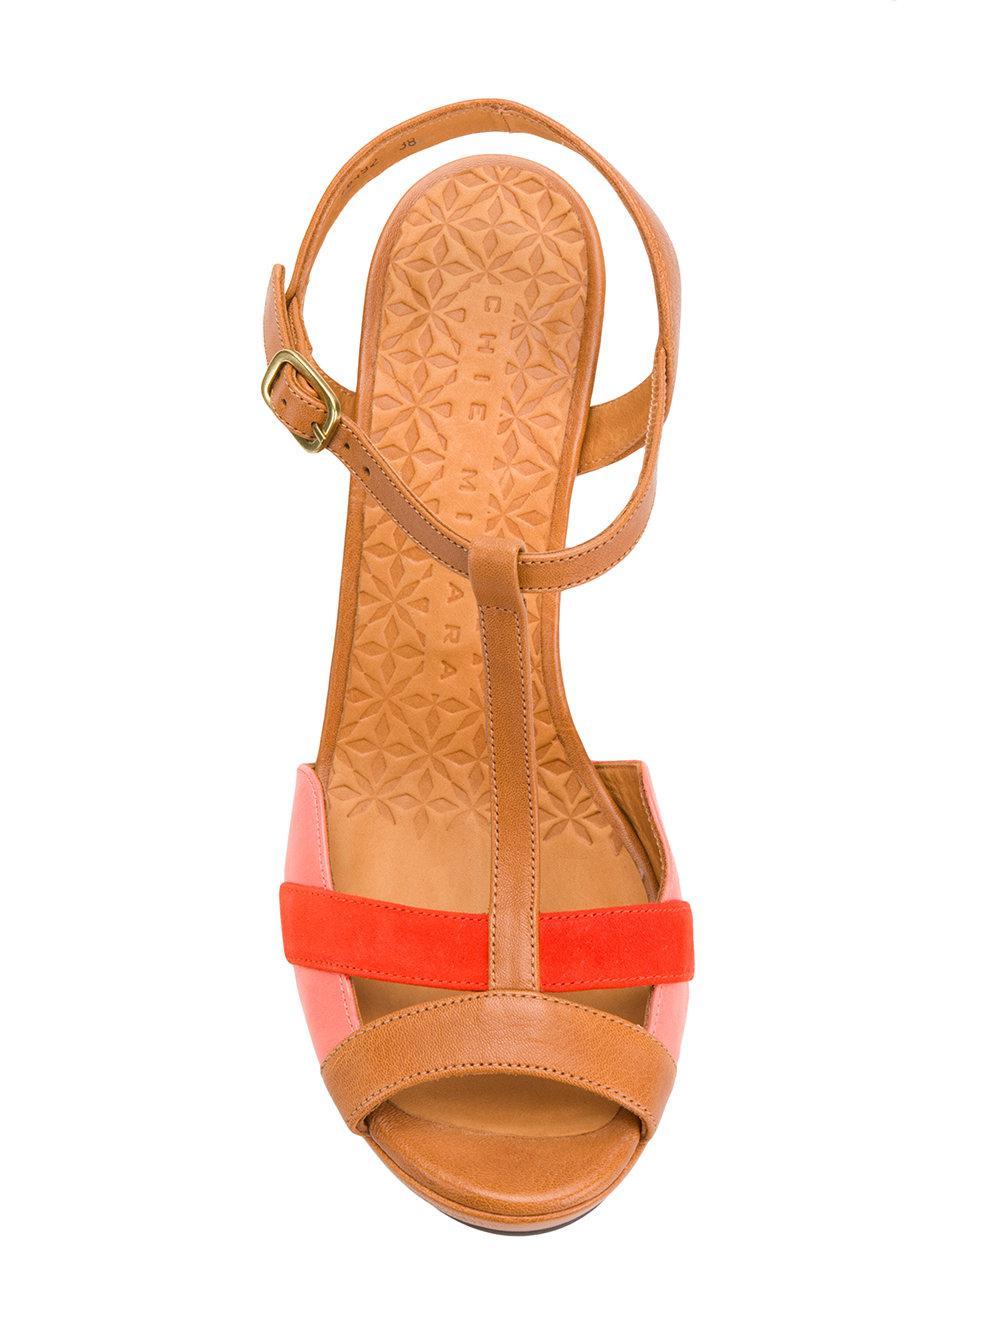 810428c53e2 Lyst - Chie Mihara Peep Toe Block Heel Sandals in Brown